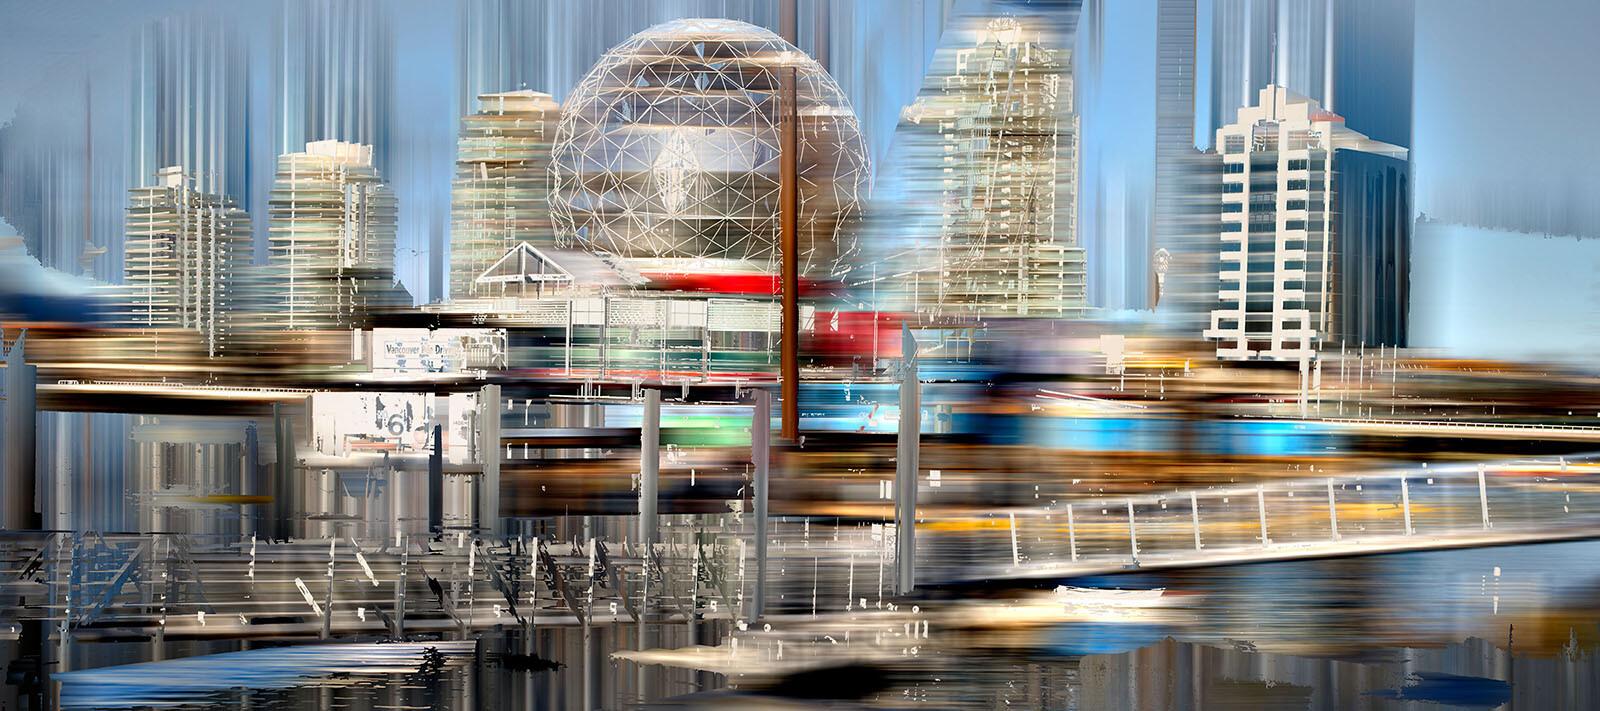 Vancouver Projection II - Sabine Wild